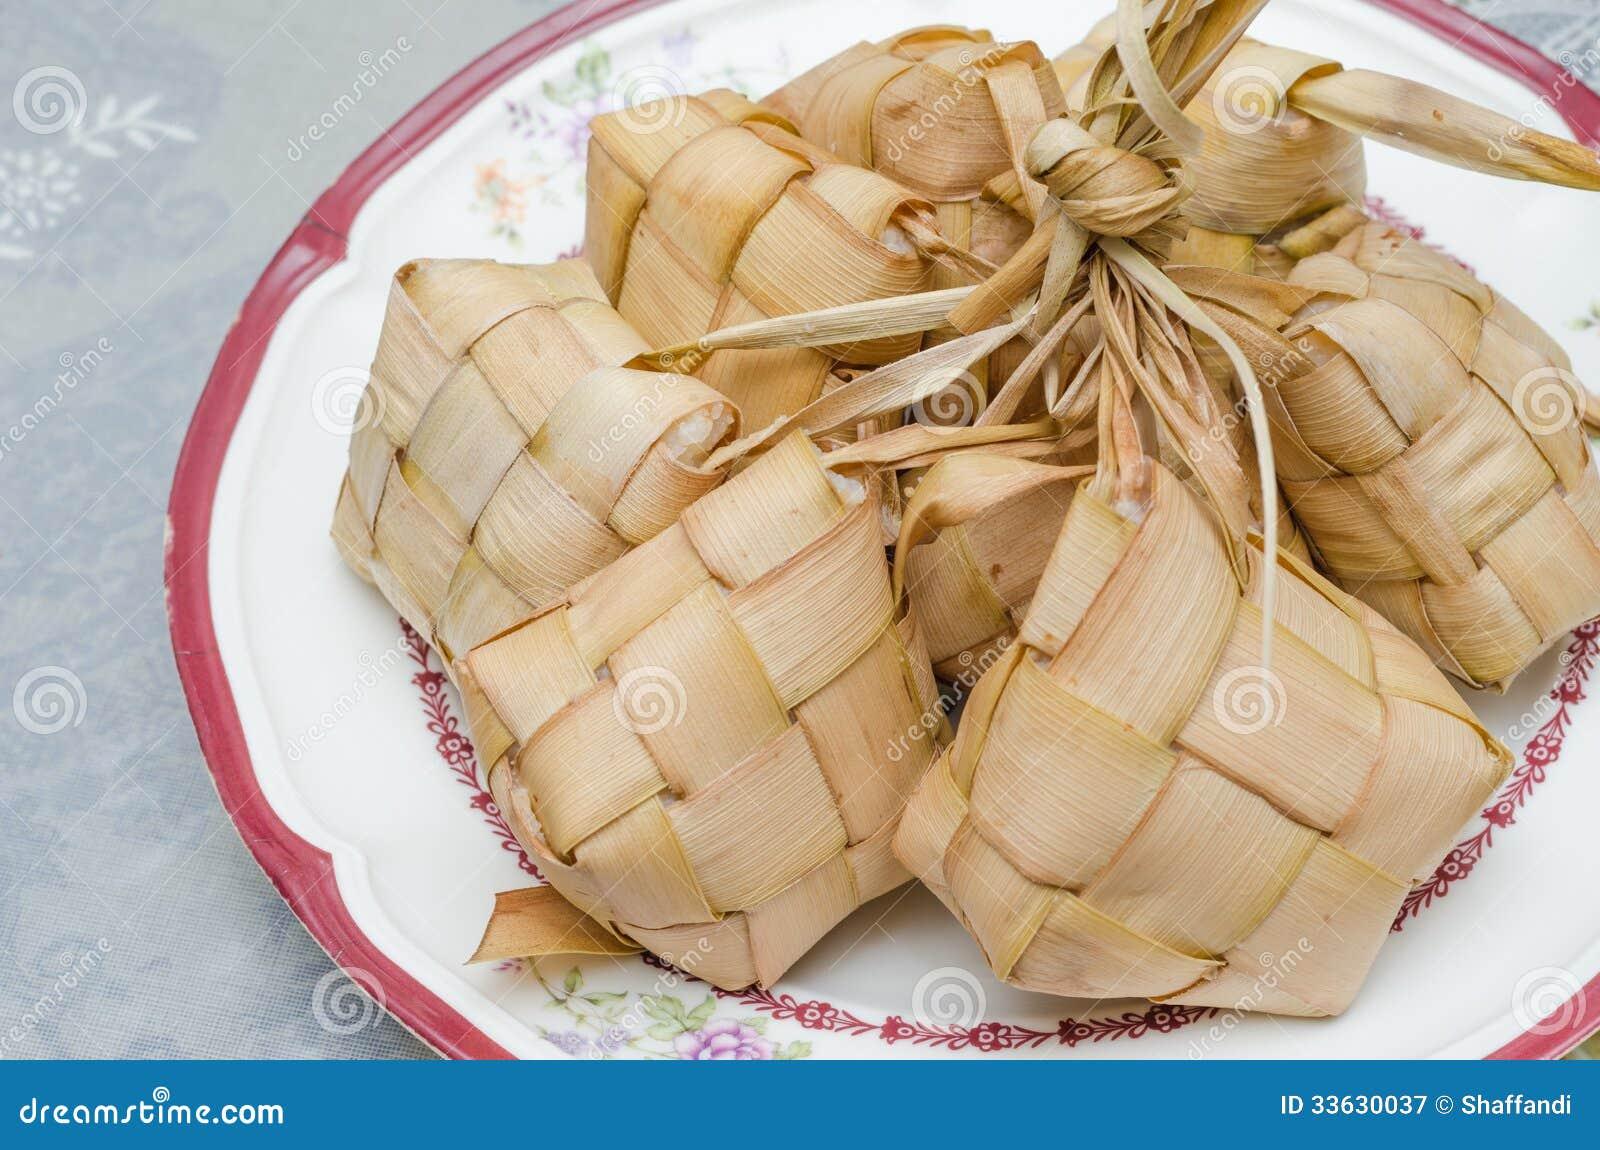 ketupat rice dumpling is - photo #1